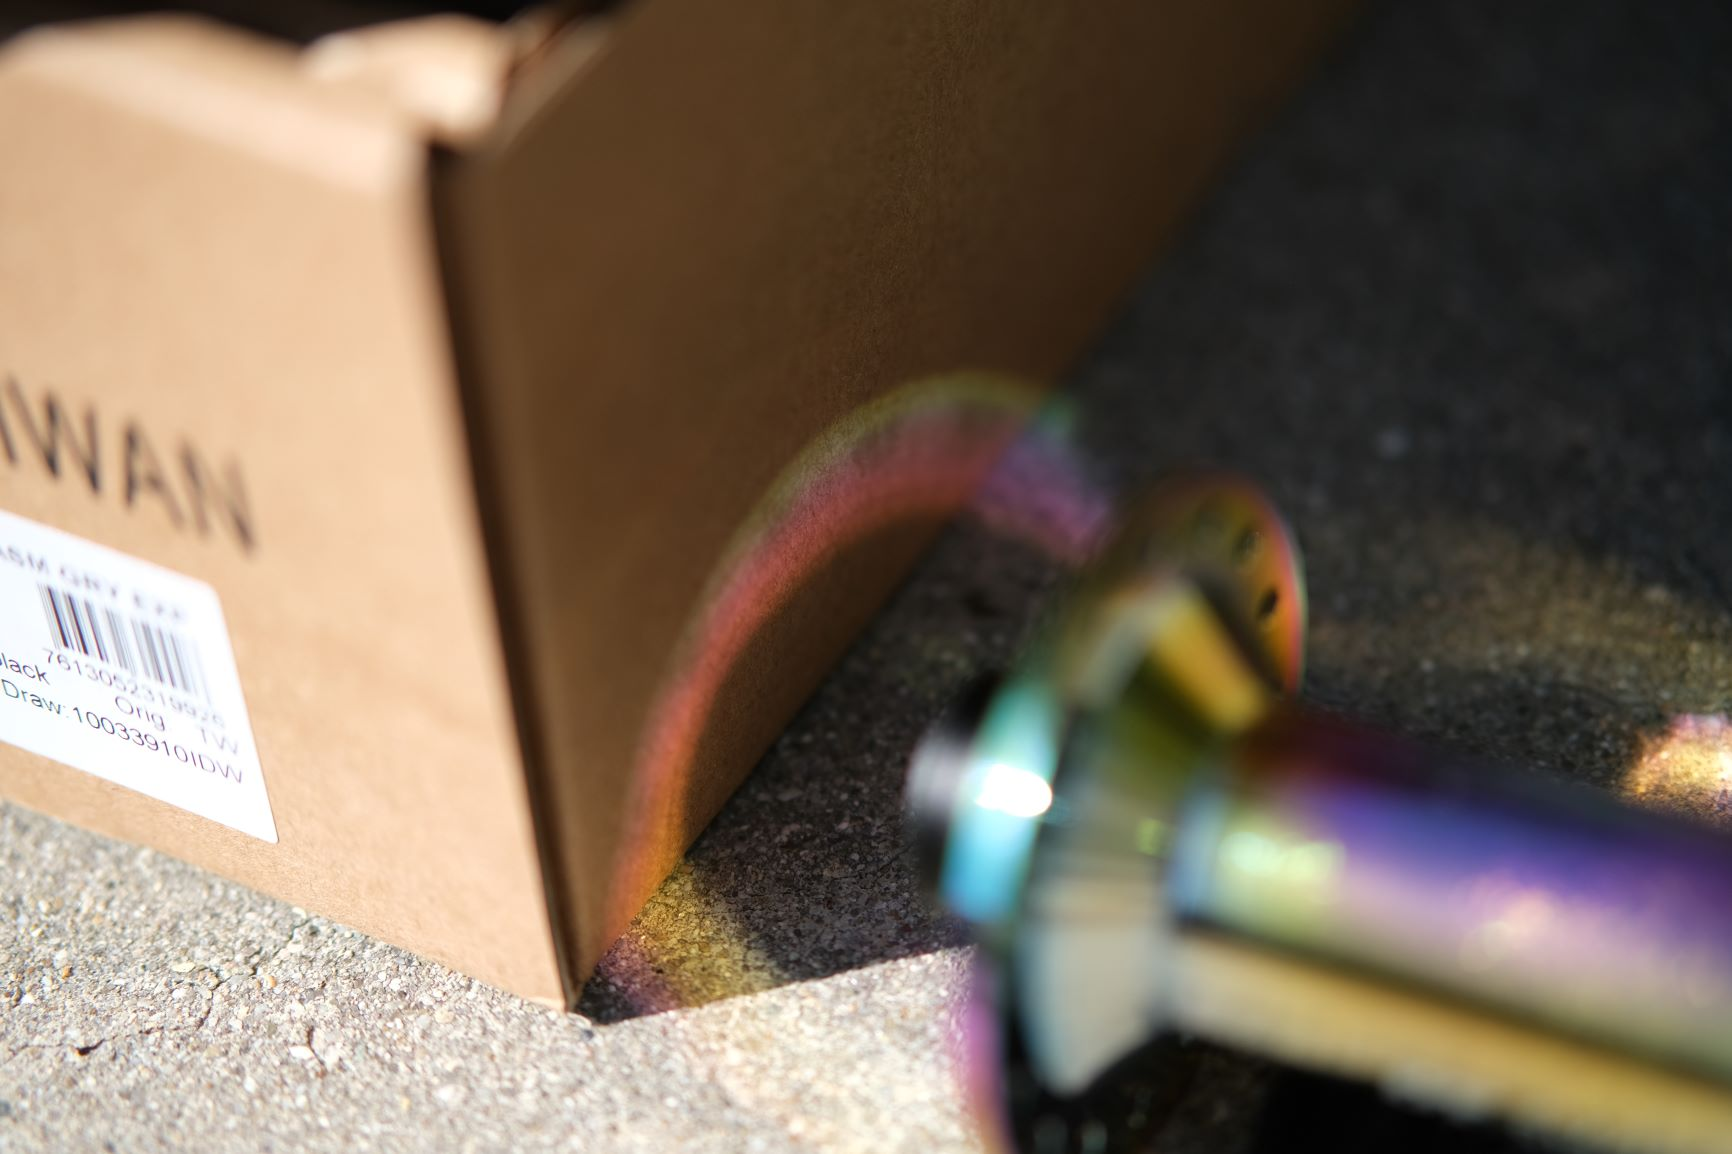 DT Swiss oil-slick hub throws a rainbow onto its box